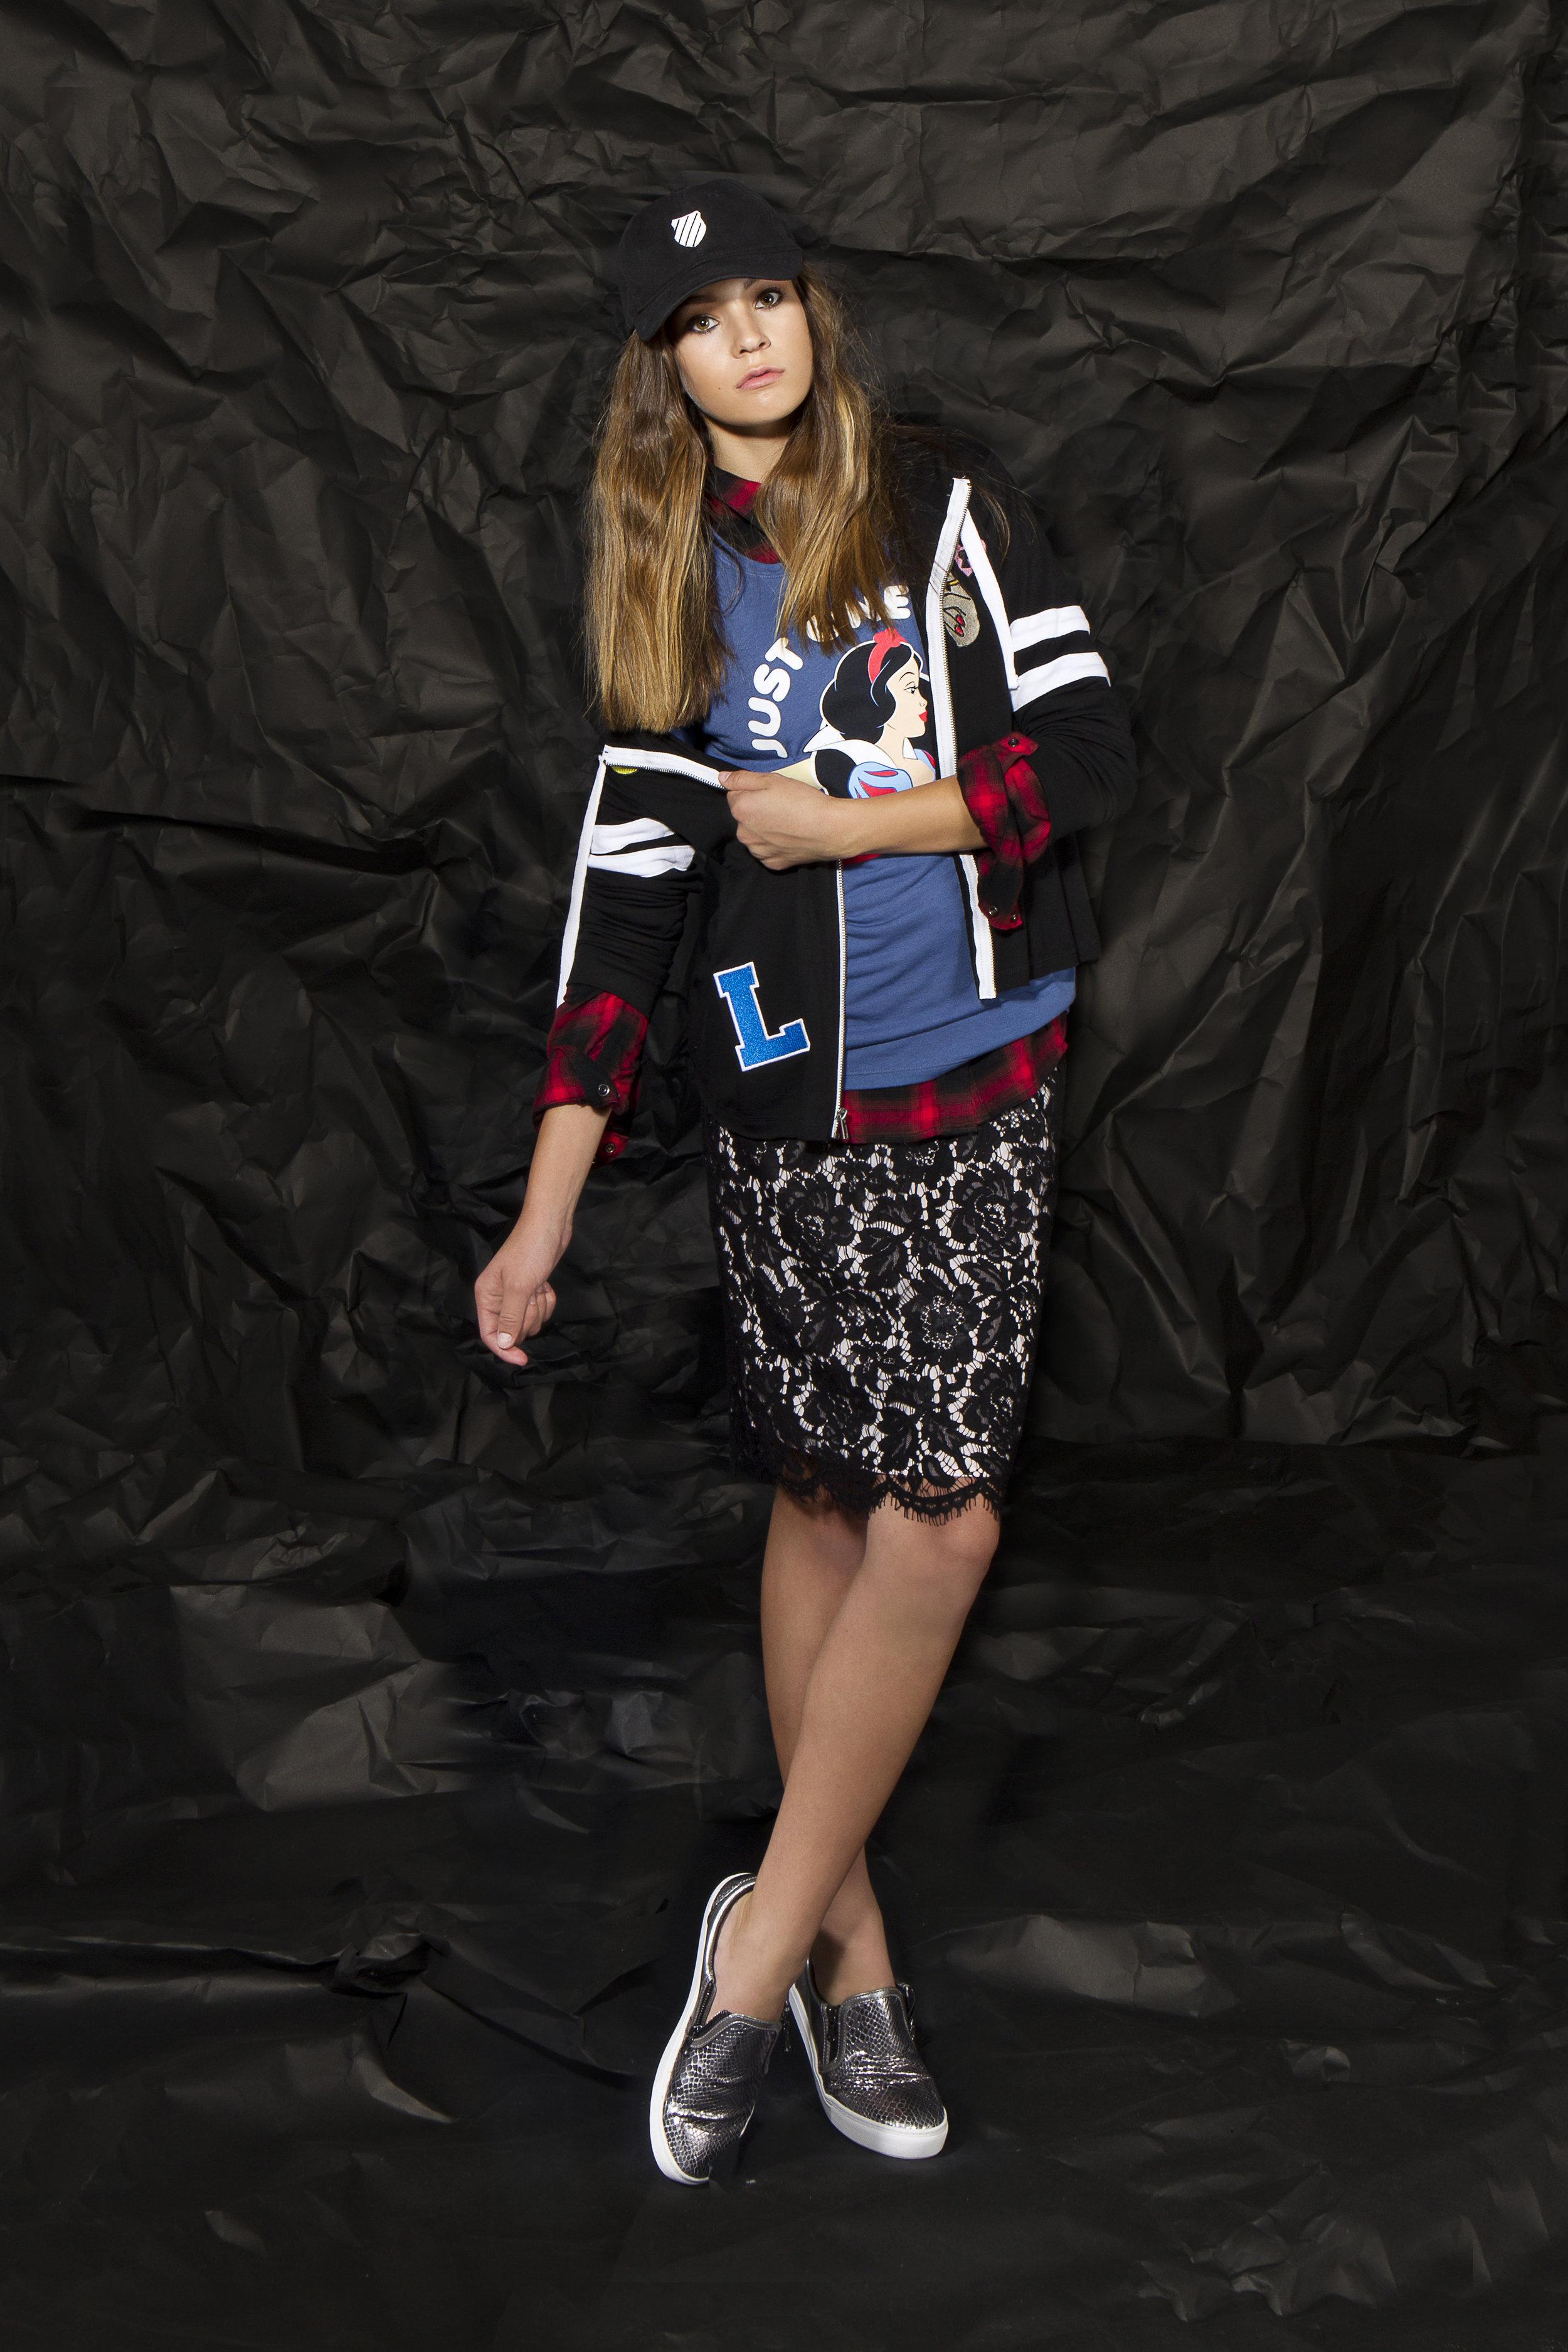 SKIRT SKATER  shirt : Sanctuary | hoodie : Miss Chievous | tee : Disney | shoe : Steve Madden | hat : K-Swiss